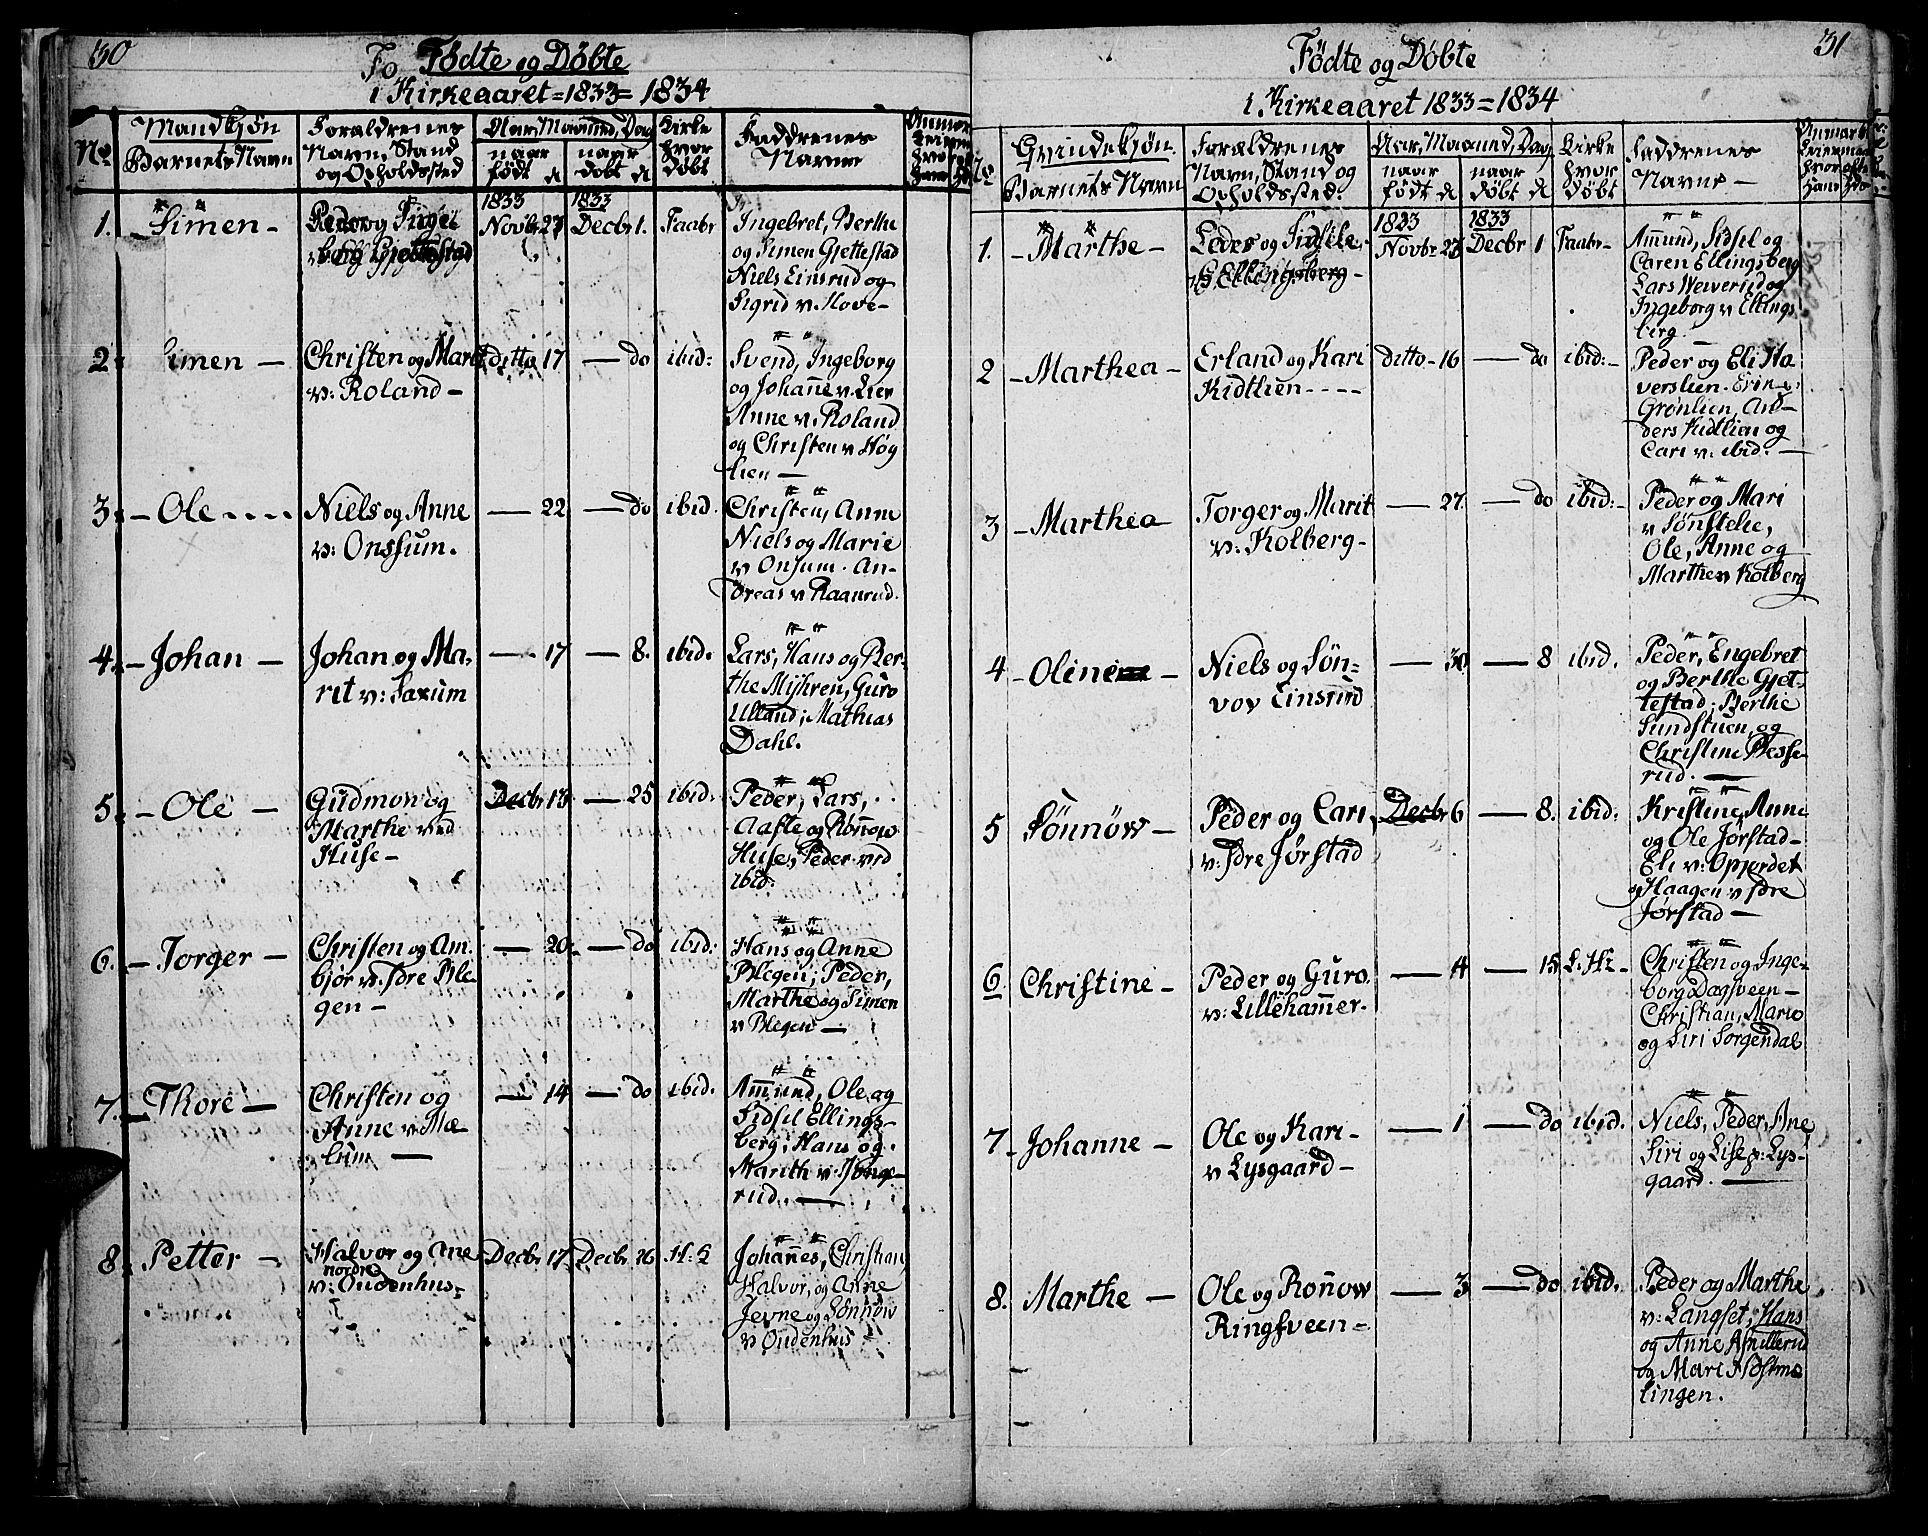 SAH, Fåberg prestekontor, Ministerialbok nr. 4, 1833-1837, s. 30-31